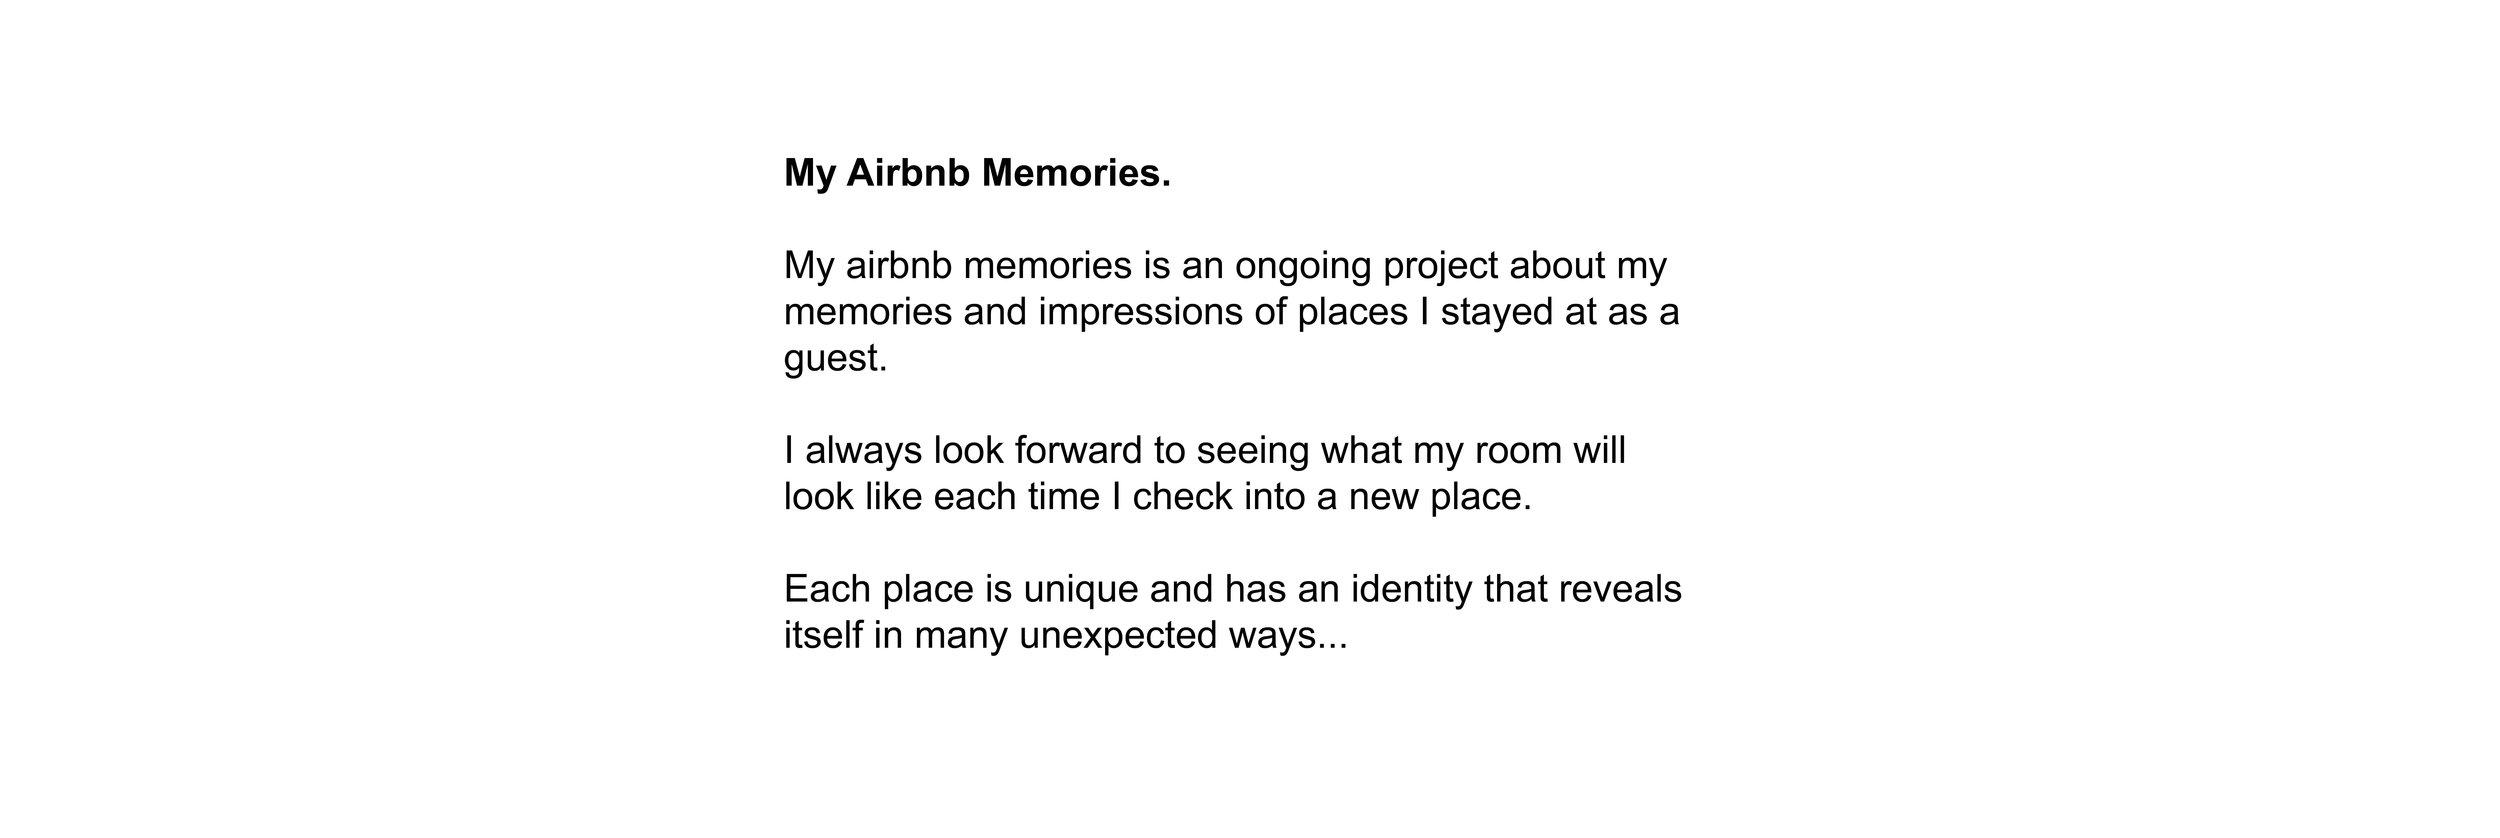 airbnb_text.jpg